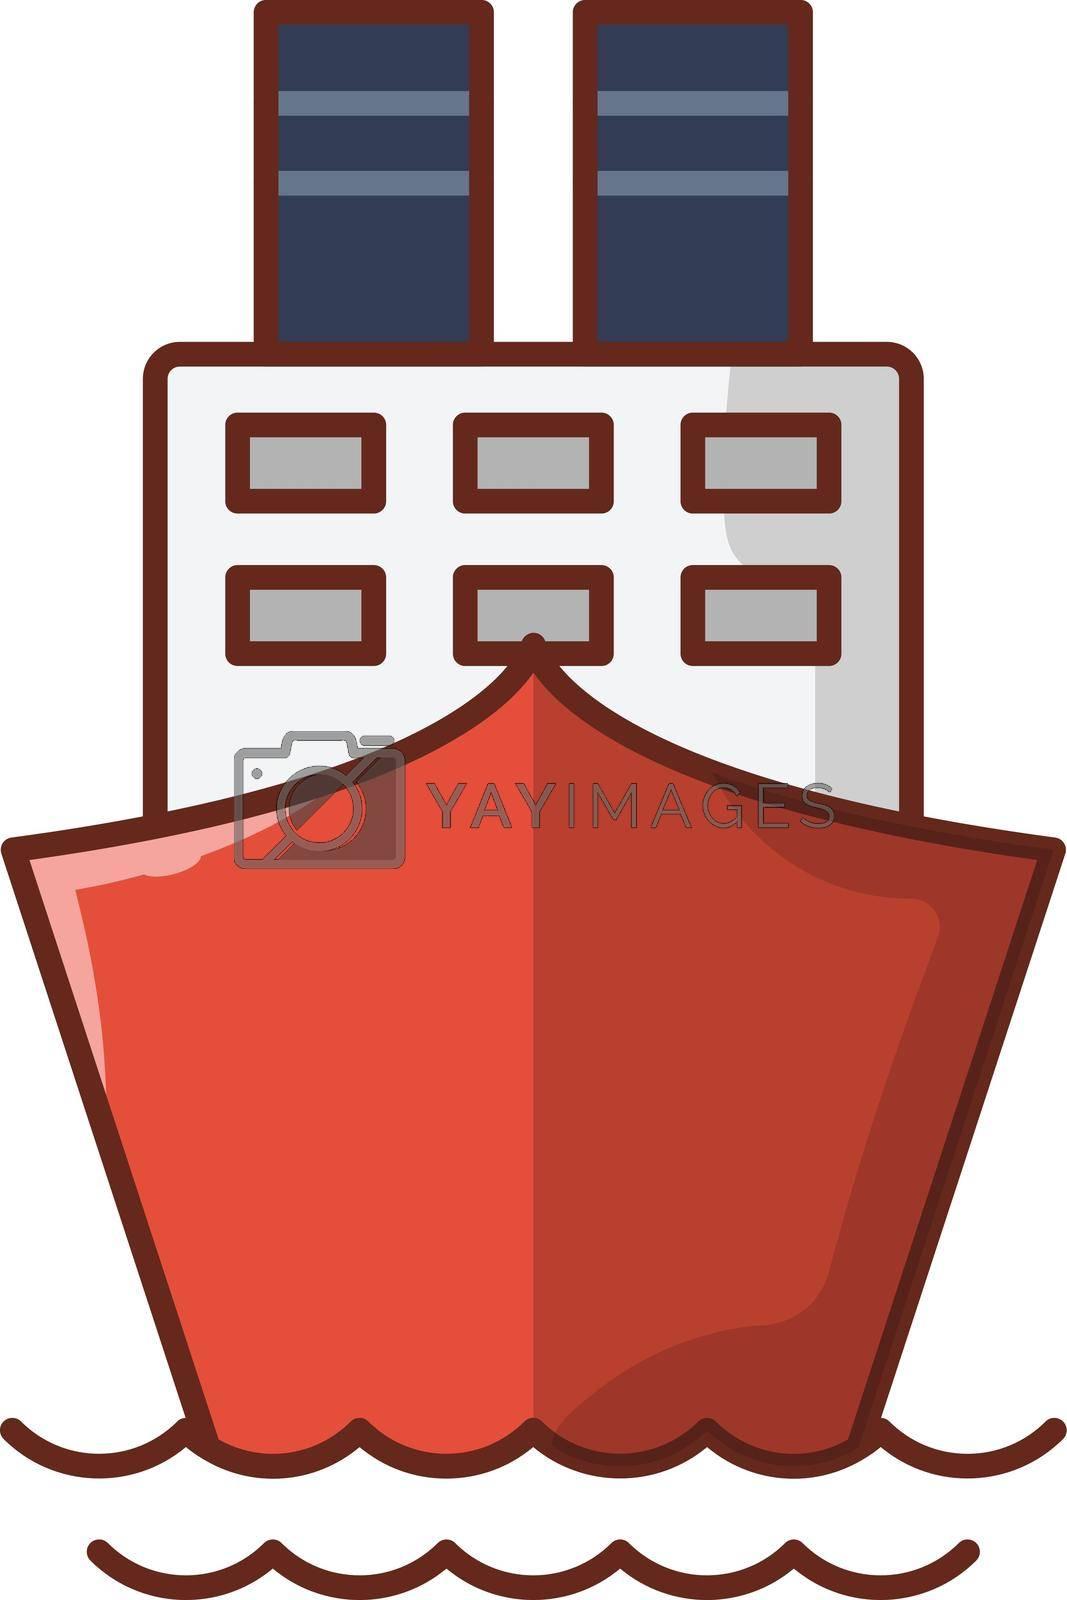 ship  by vectorstall